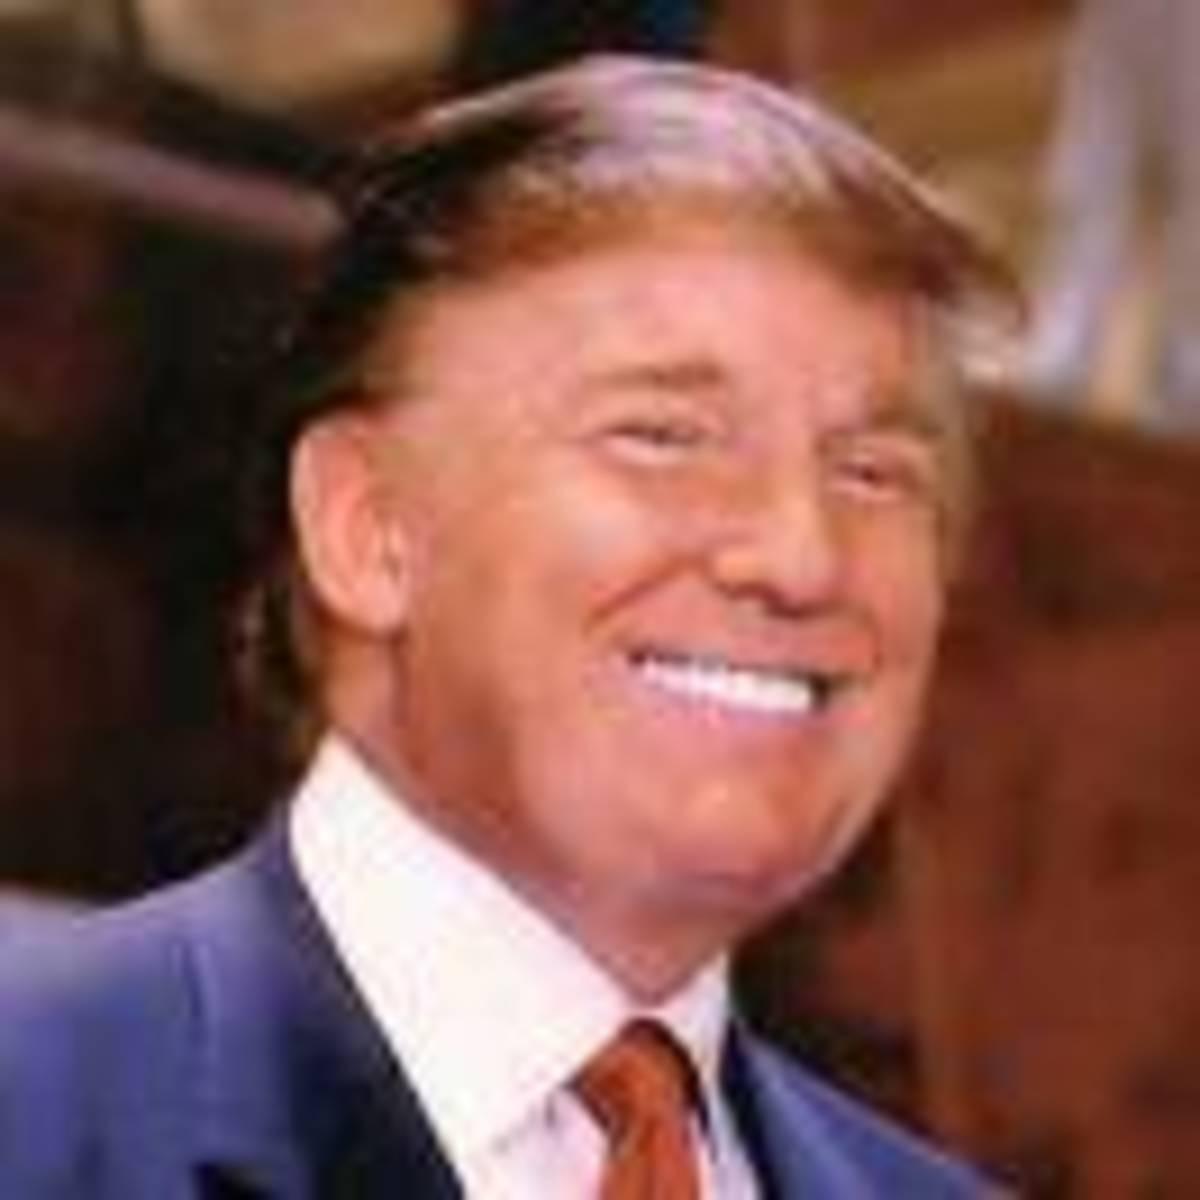 Donald Trump President Elect.